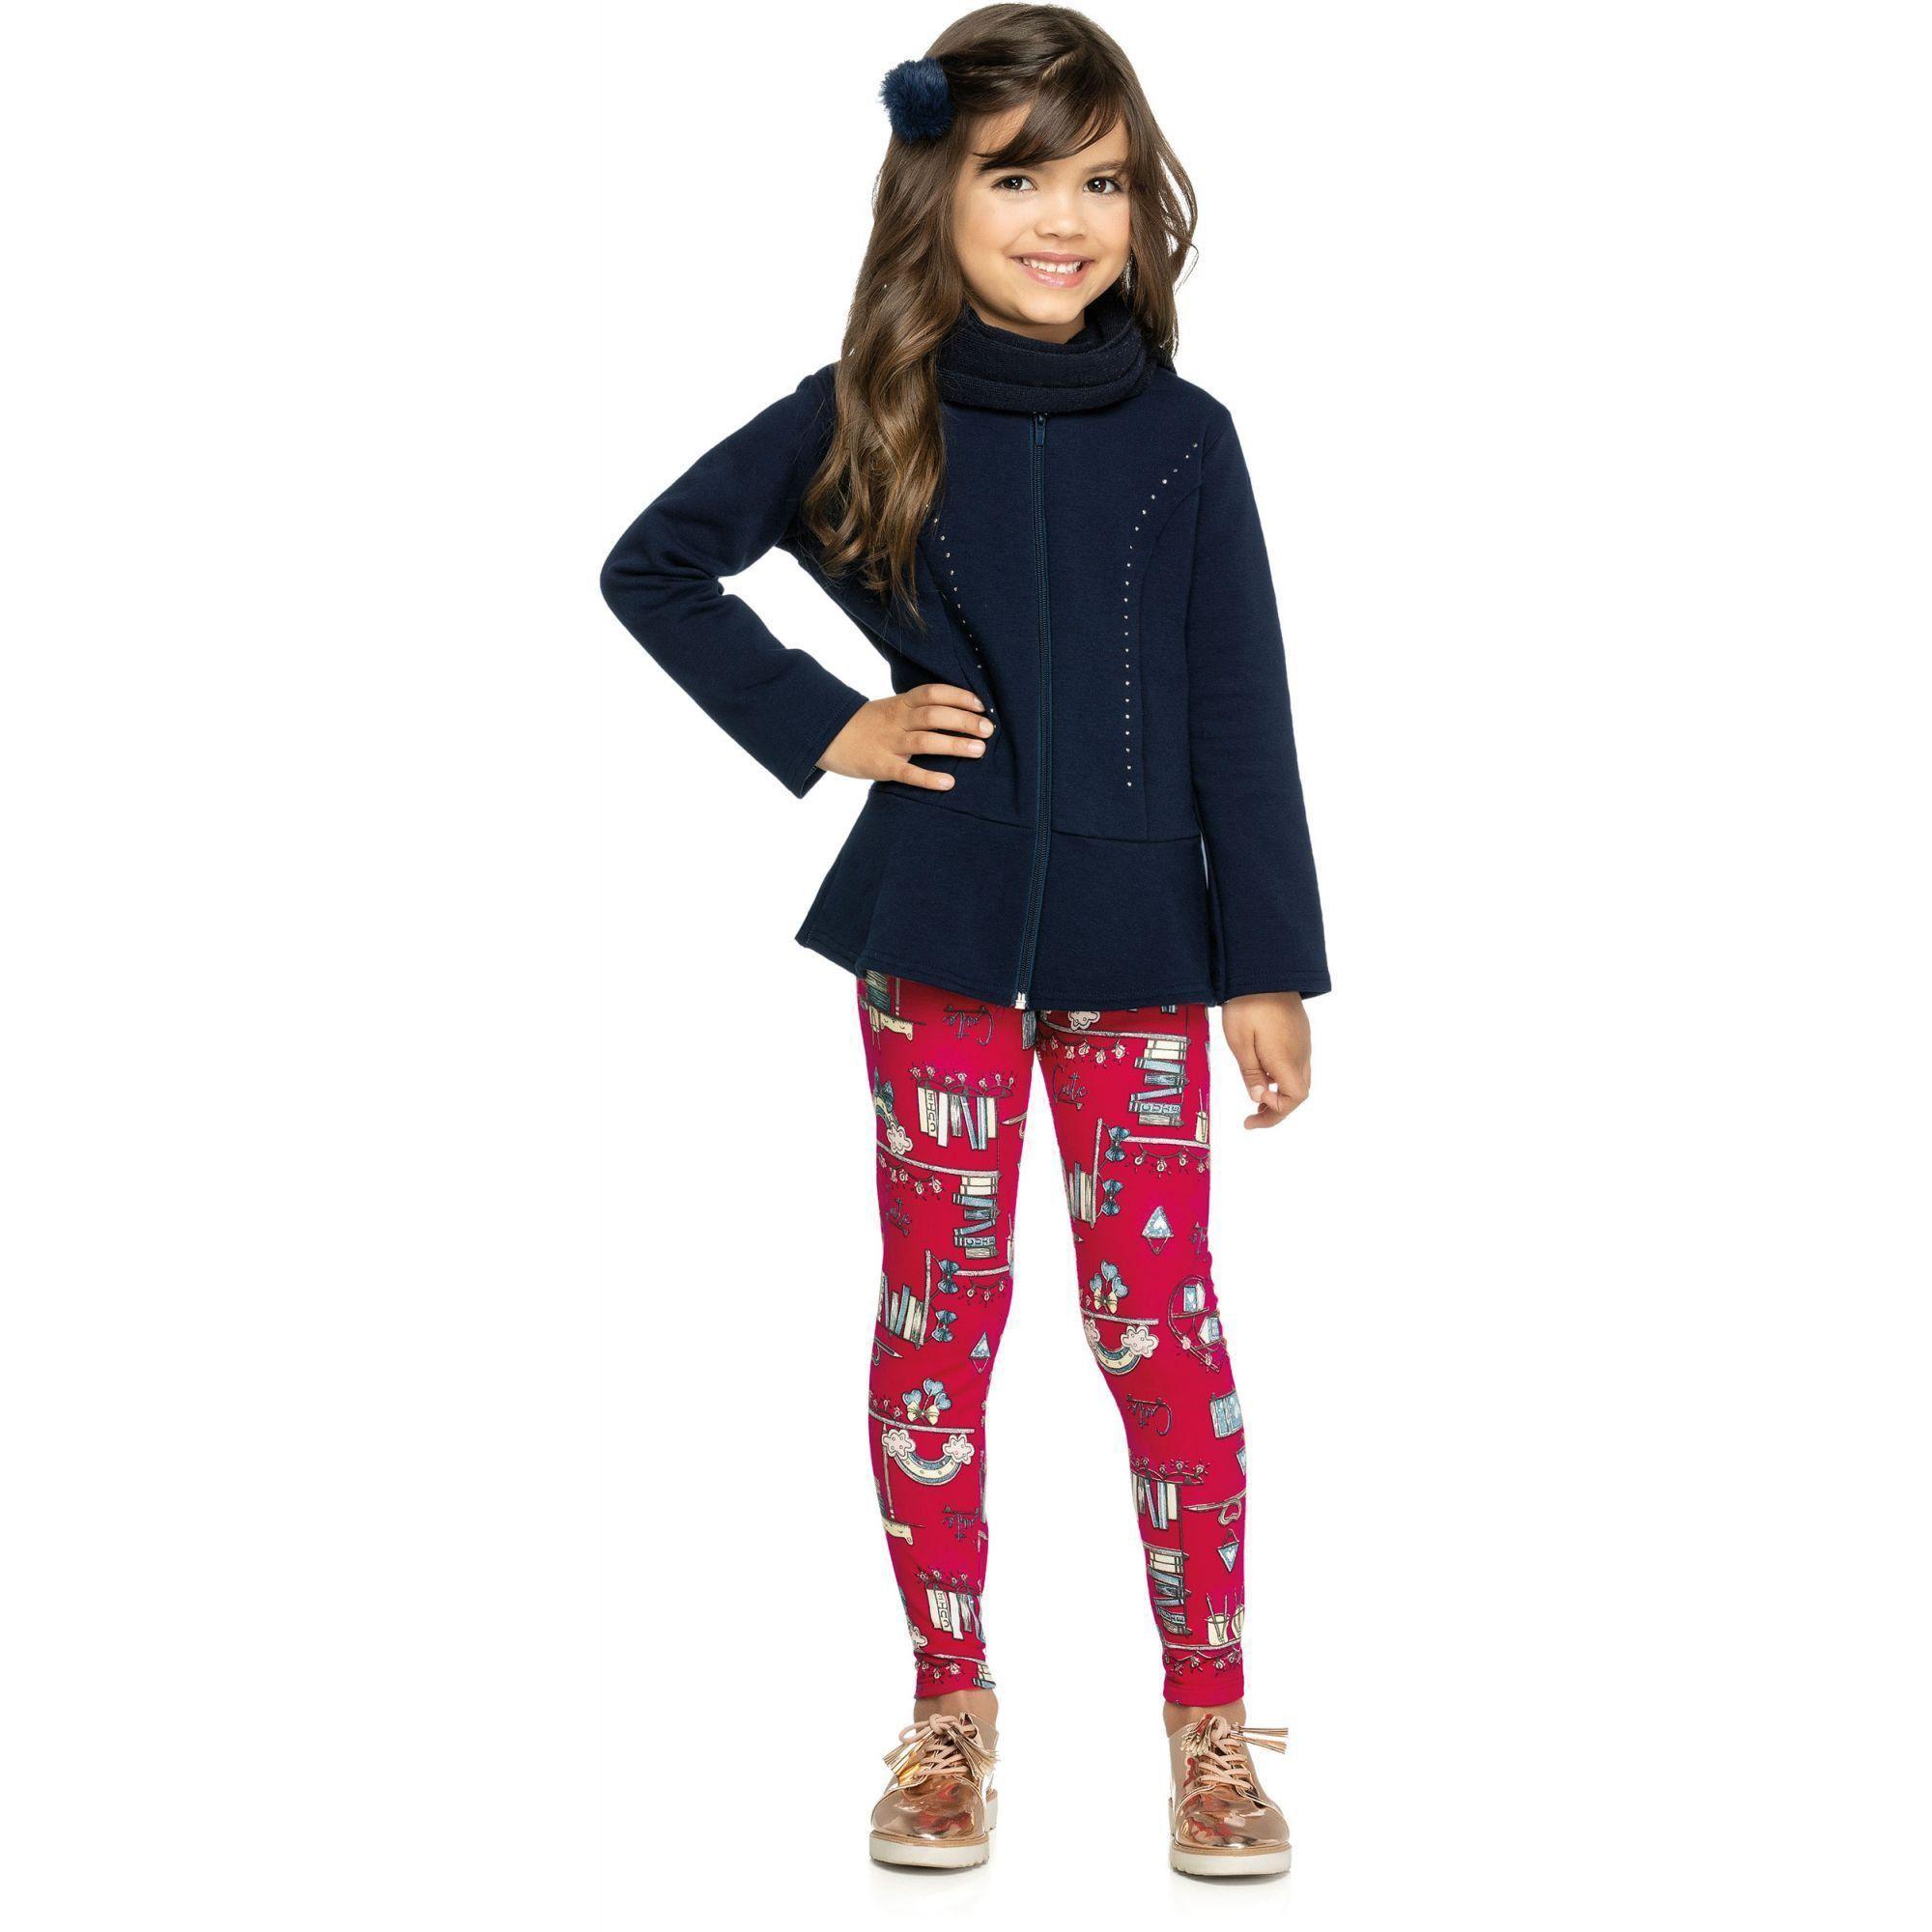 Conjunto Infantil Feminino Inverno Marinho Cute Elian